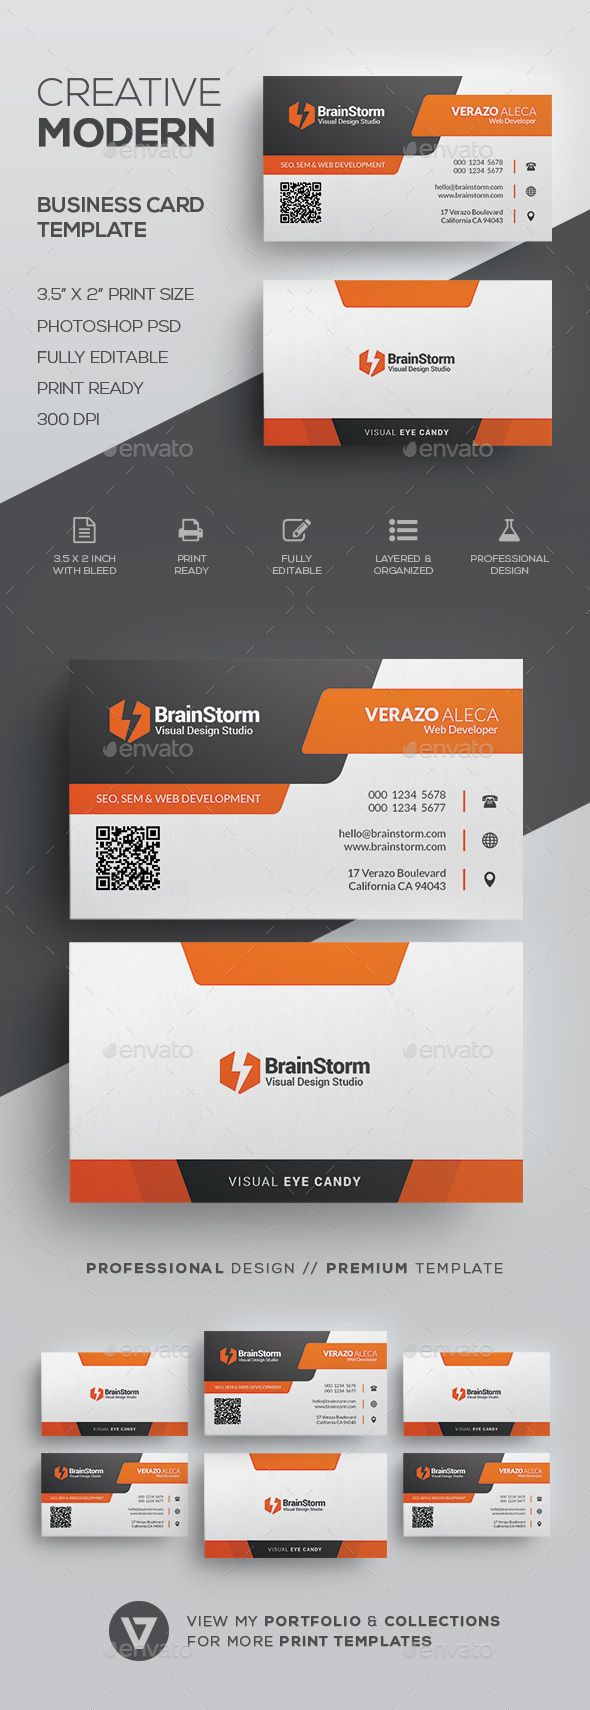 Modern Business Card Template | Corporate business, Card templates ...